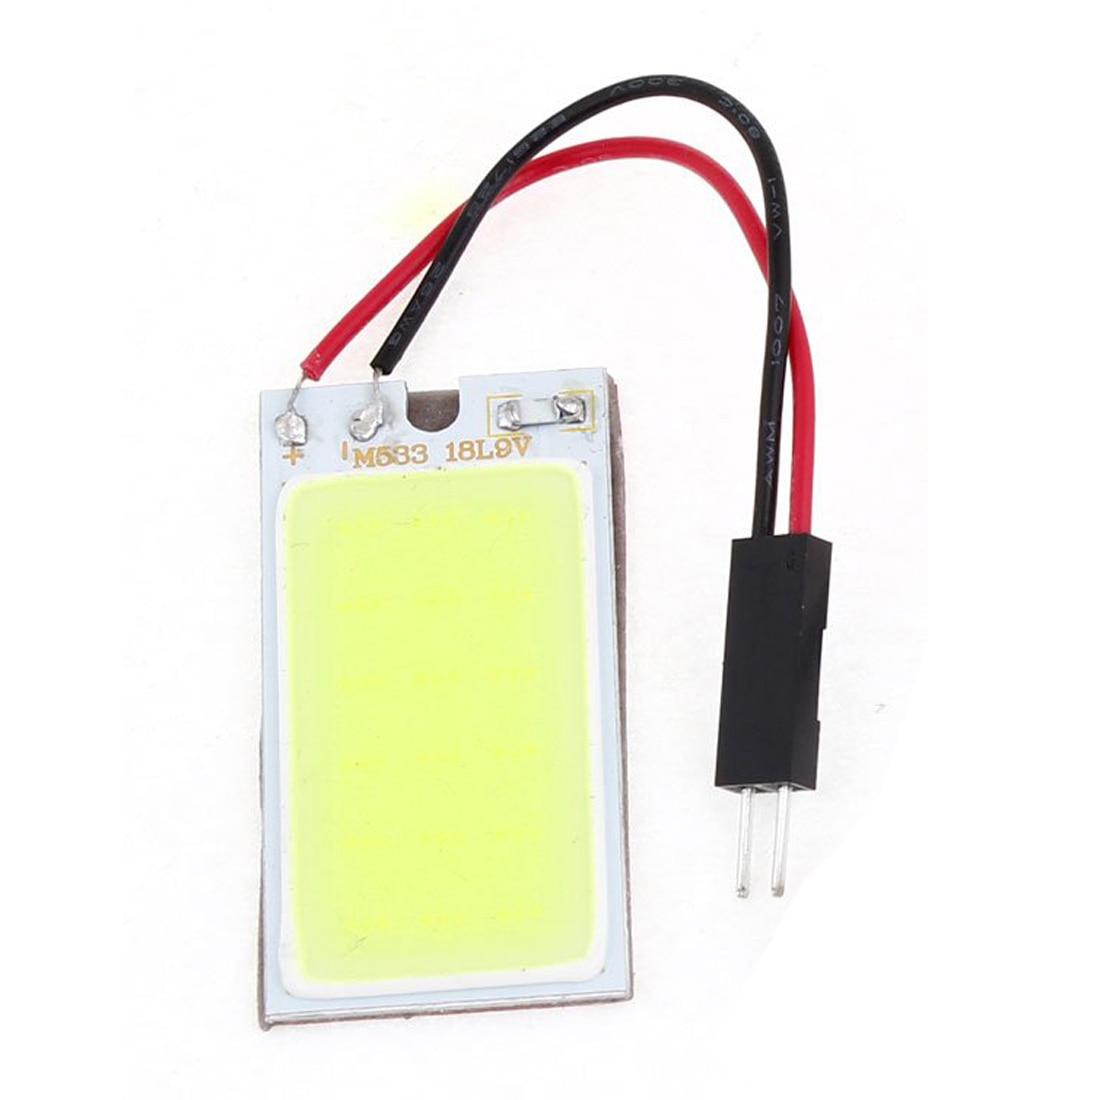 DC 12V Auto Super Bright White 18 COB LED Light Bulb Panel + T10 Festoon Adapters